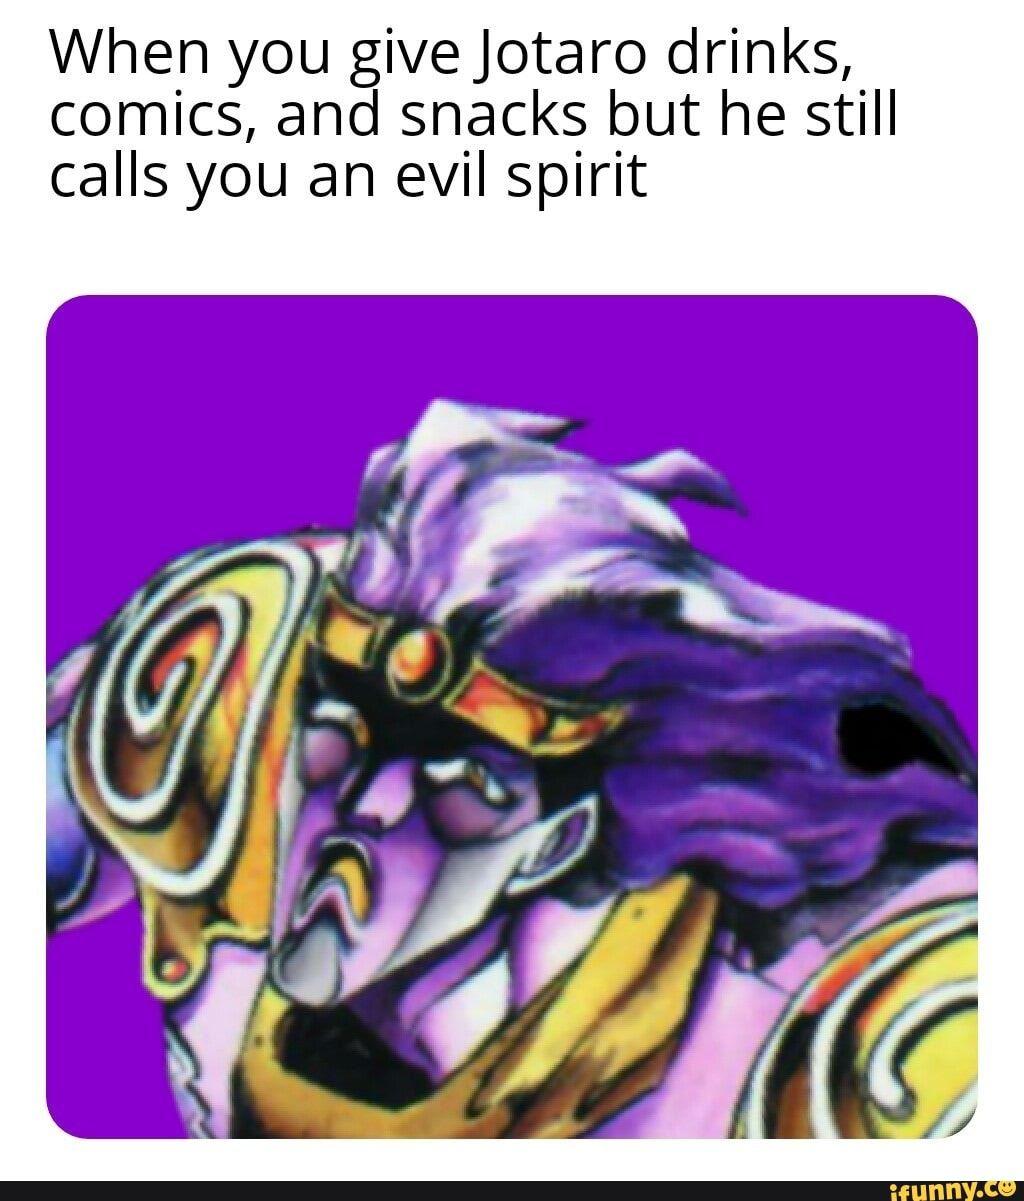 When You Givejotaro Drinks Comics And Snacks But He Still Calls You An Evil Spirit Ifunny Jojo Bizarre Jojo Bizzare Adventure Jojo S Bizarre Adventure